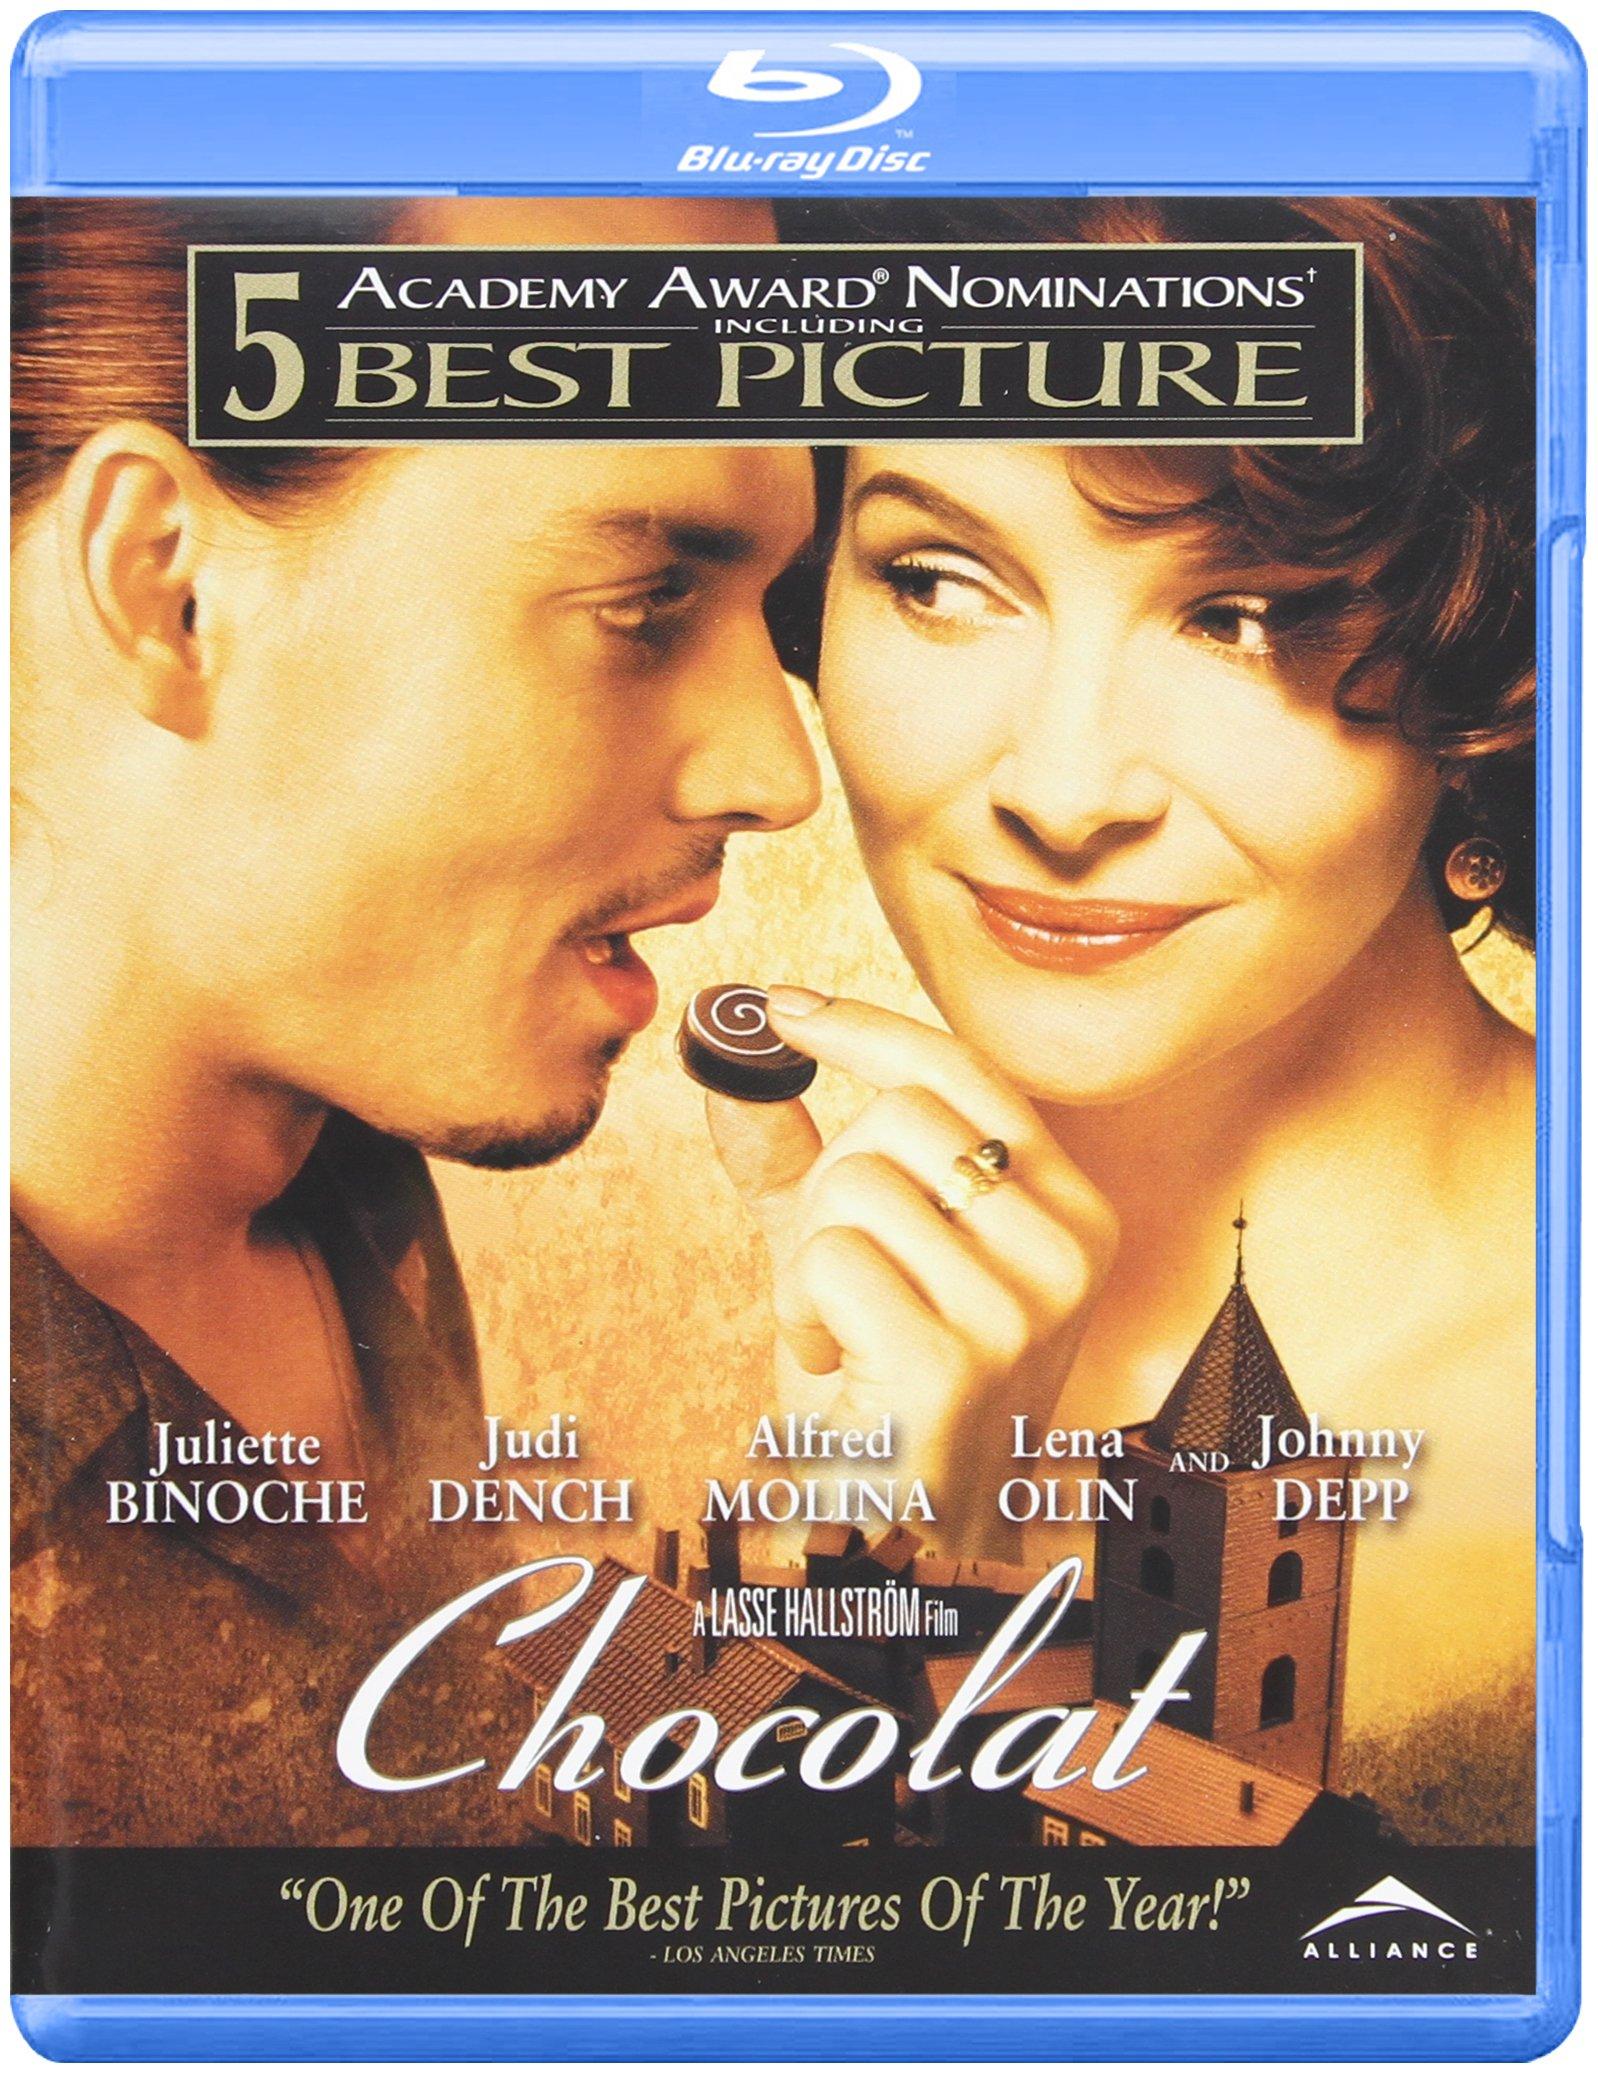 Blu-ray : Chocolat (2000) (blu-ray) (Blu-ray)